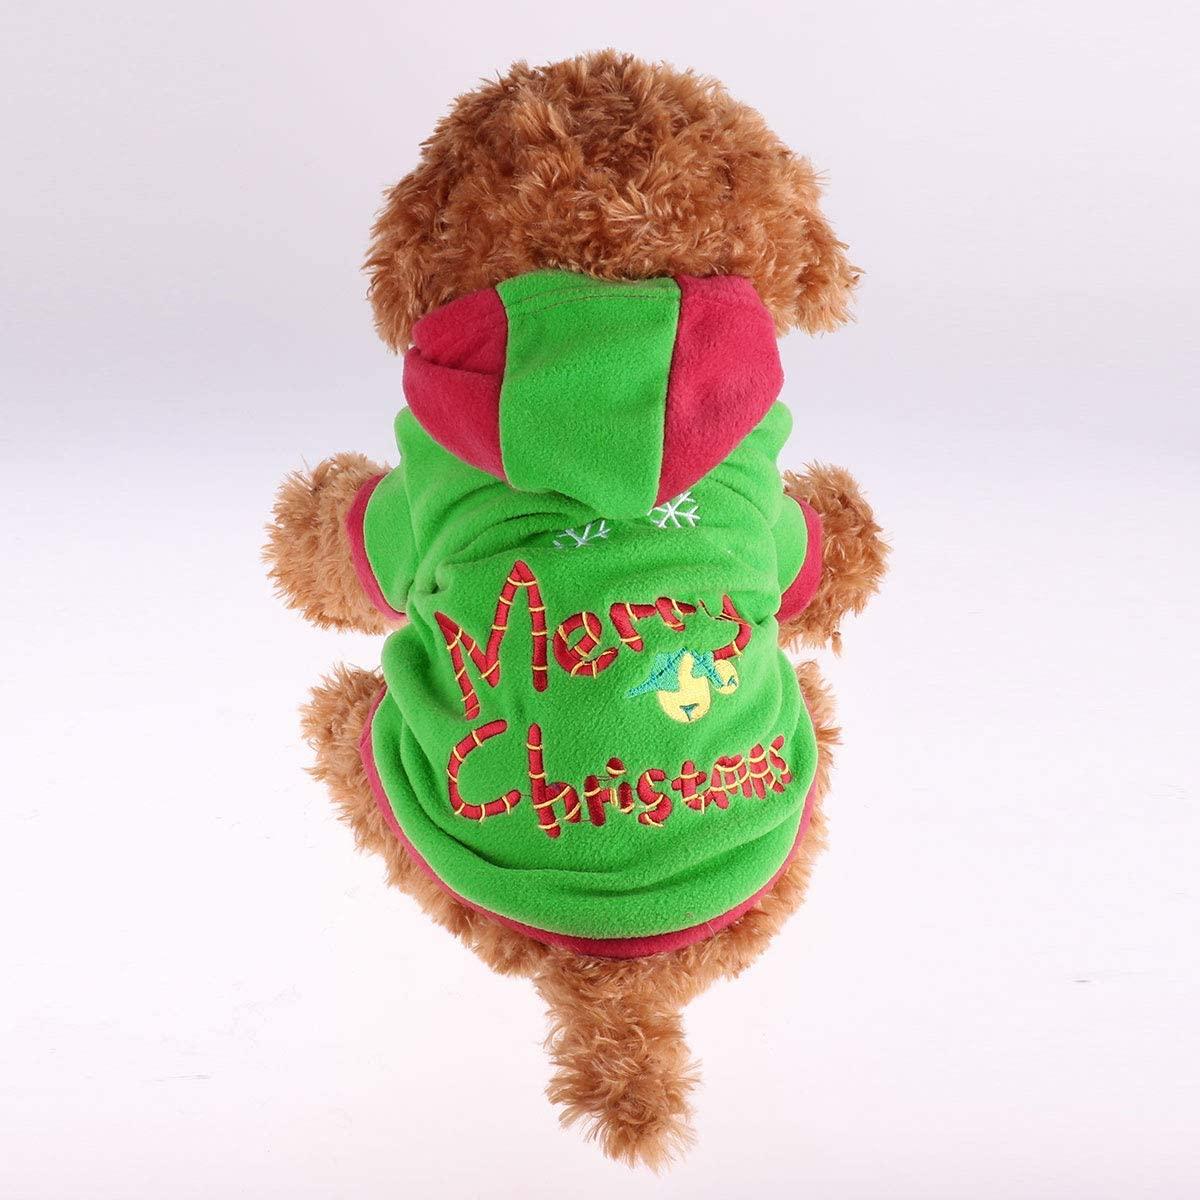 TiaoBug Dog Short Sleeves Shirt Costume Xmas Tree Pet Clothes Hoodie Holiday Pet Coat Apparel